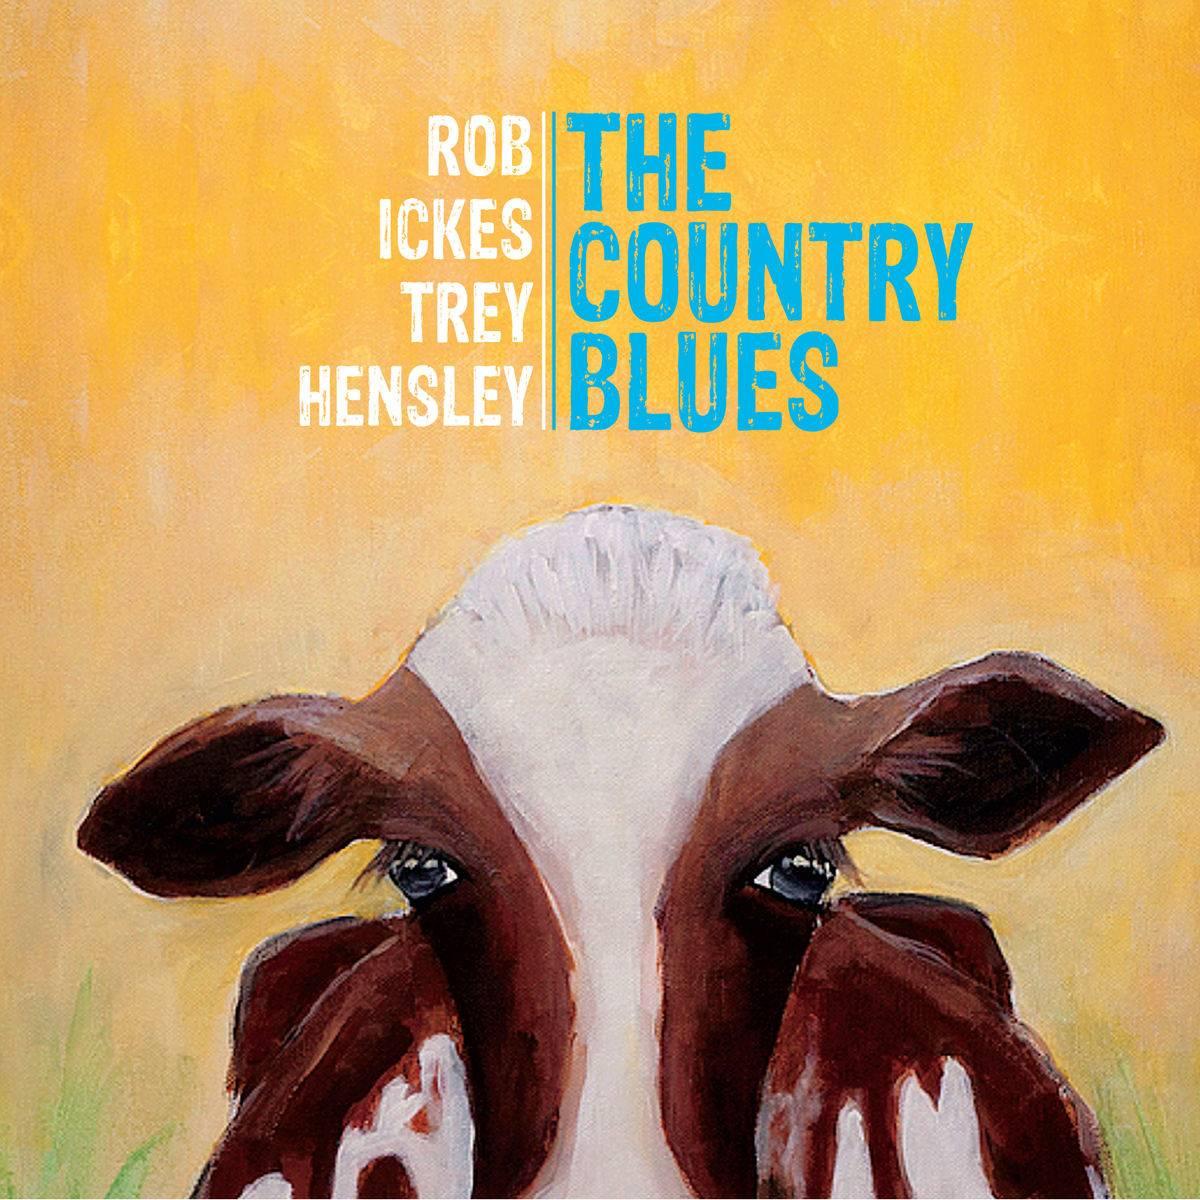 Rob Ickes & Trey Hensley - The Country Blues (2016)